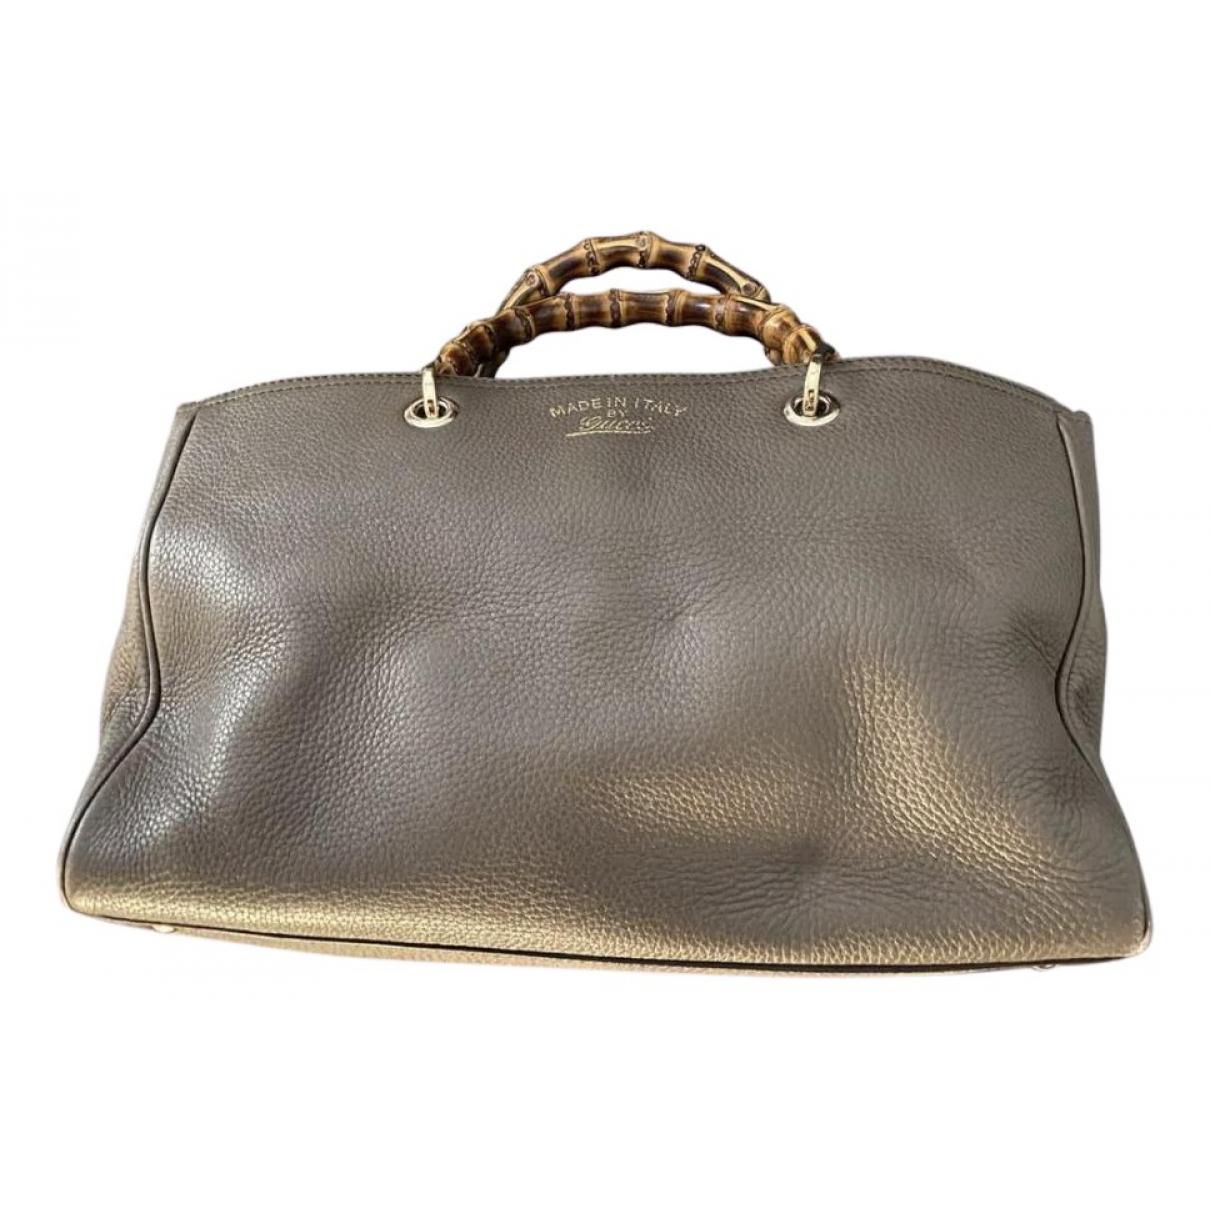 Gucci Bamboo Handtasche in  Grau Leder